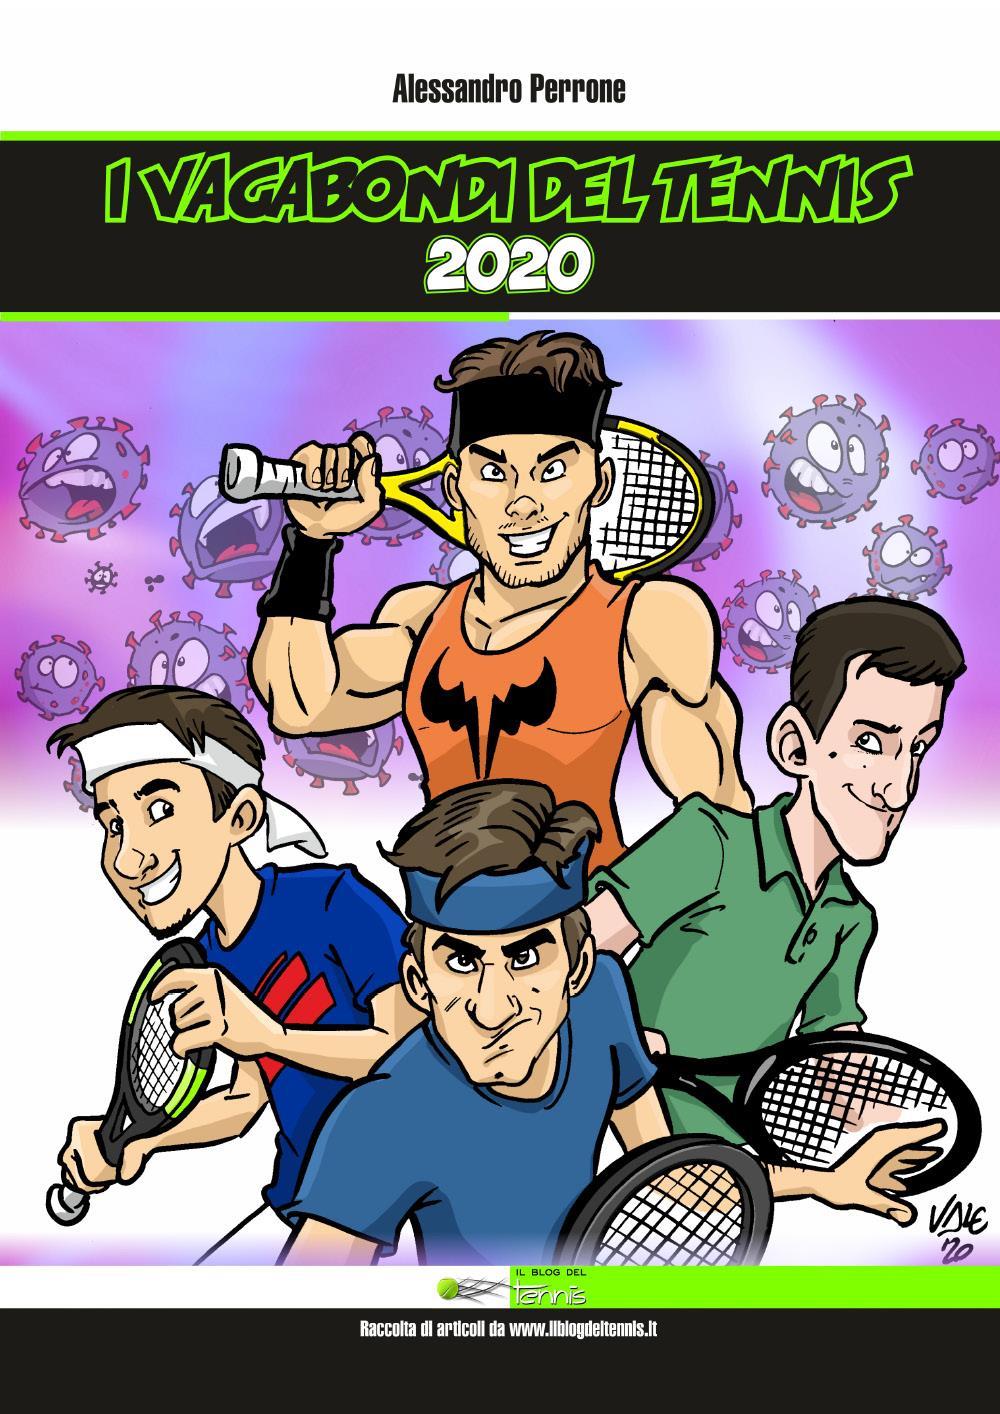 I vagabondi del tennis 2020